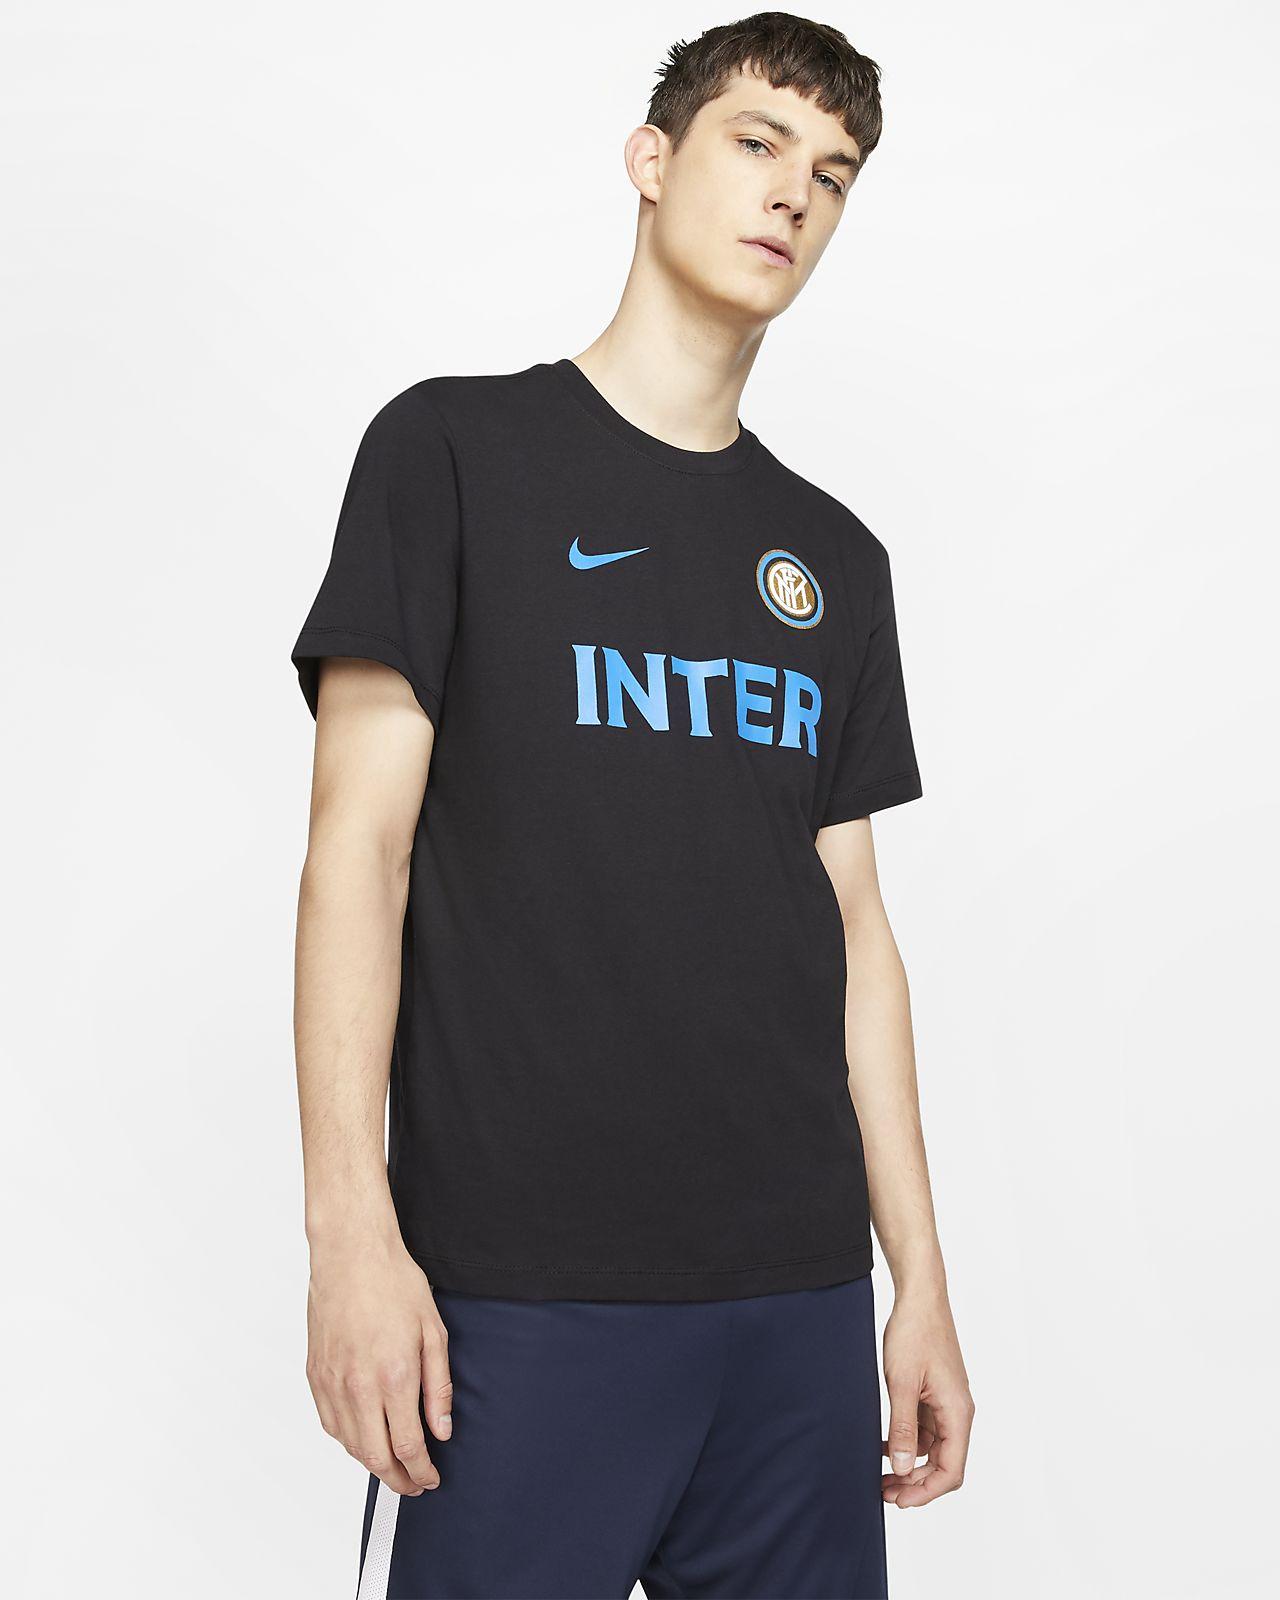 Tee-shirt Inter Milan pour Homme